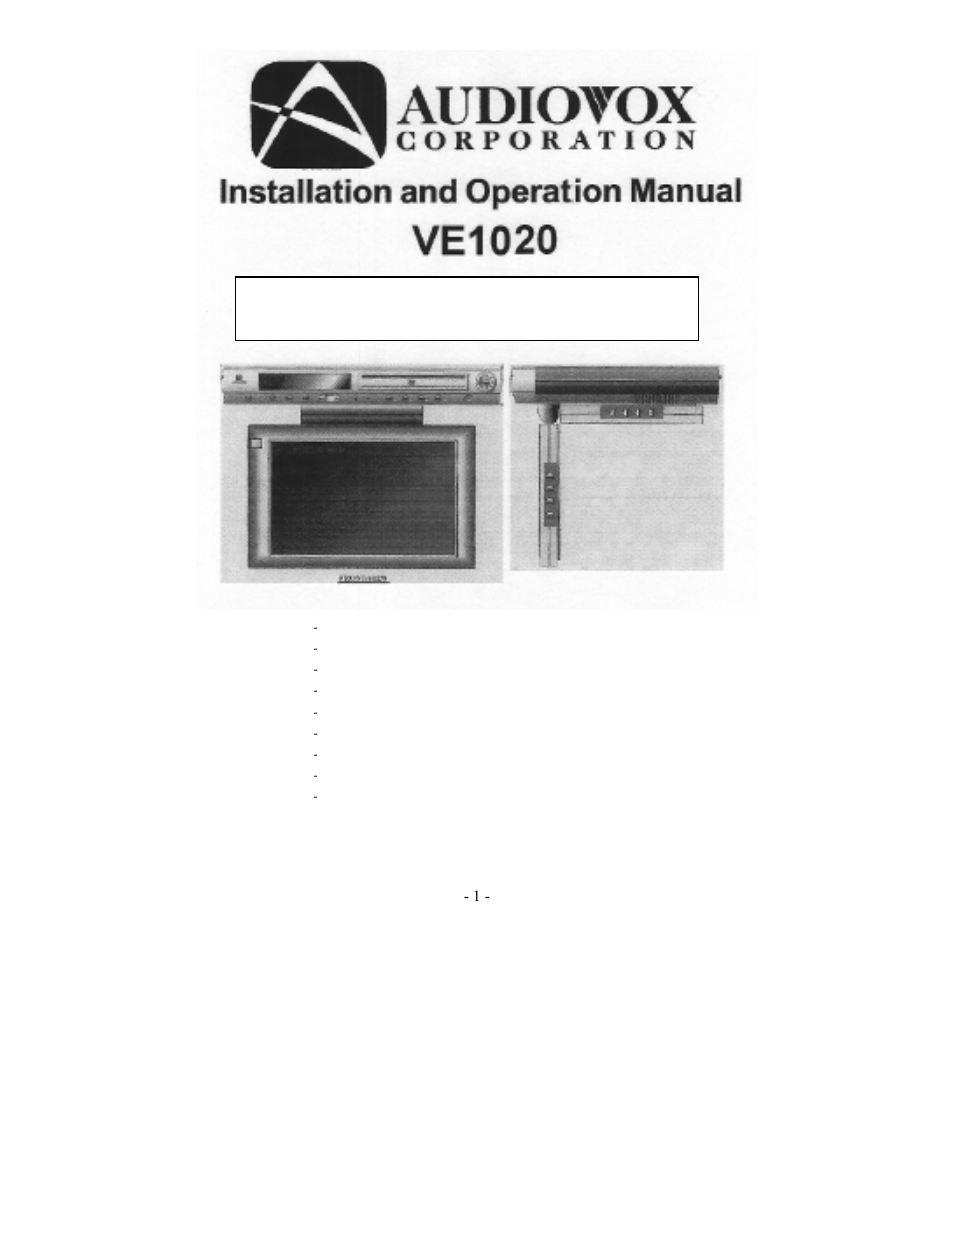 medium resolution of audiovox manuals free with audiovox manuals on prestige remote car starter diagram audiovox alarm wiring